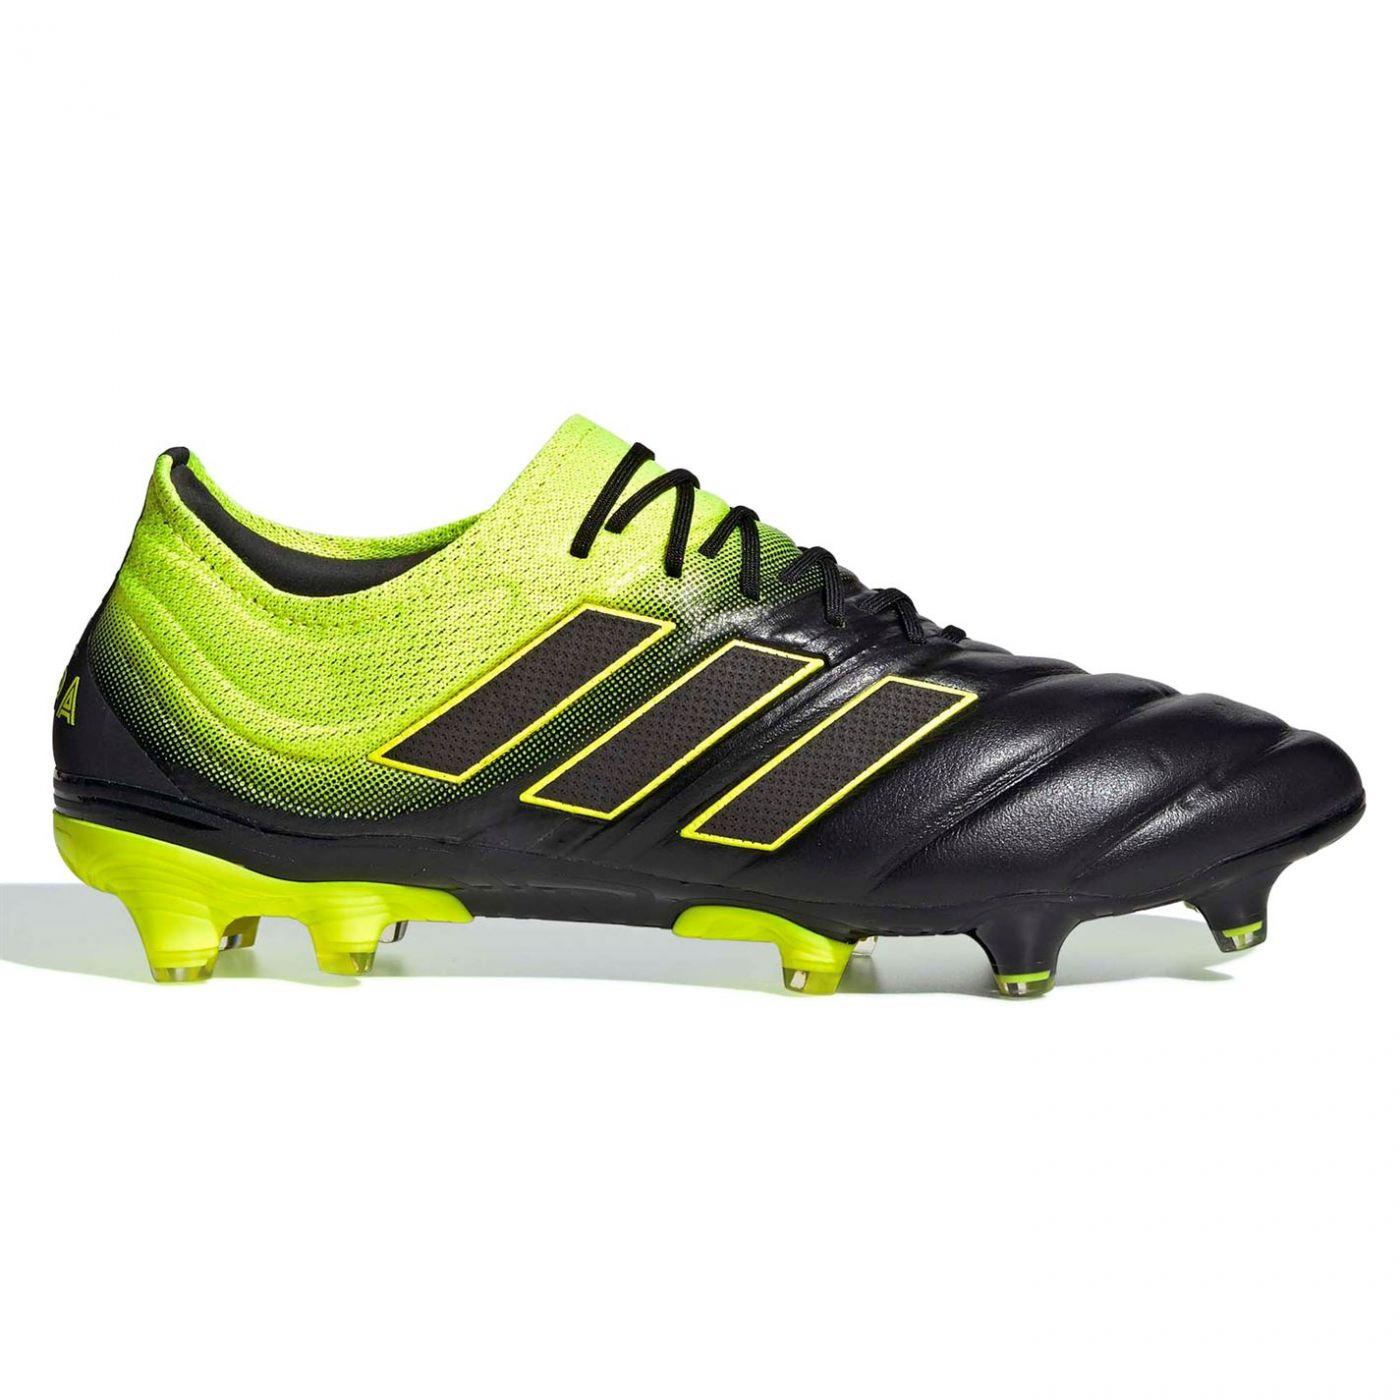 Adidas Copa 19.1 Mens FG Football Boots